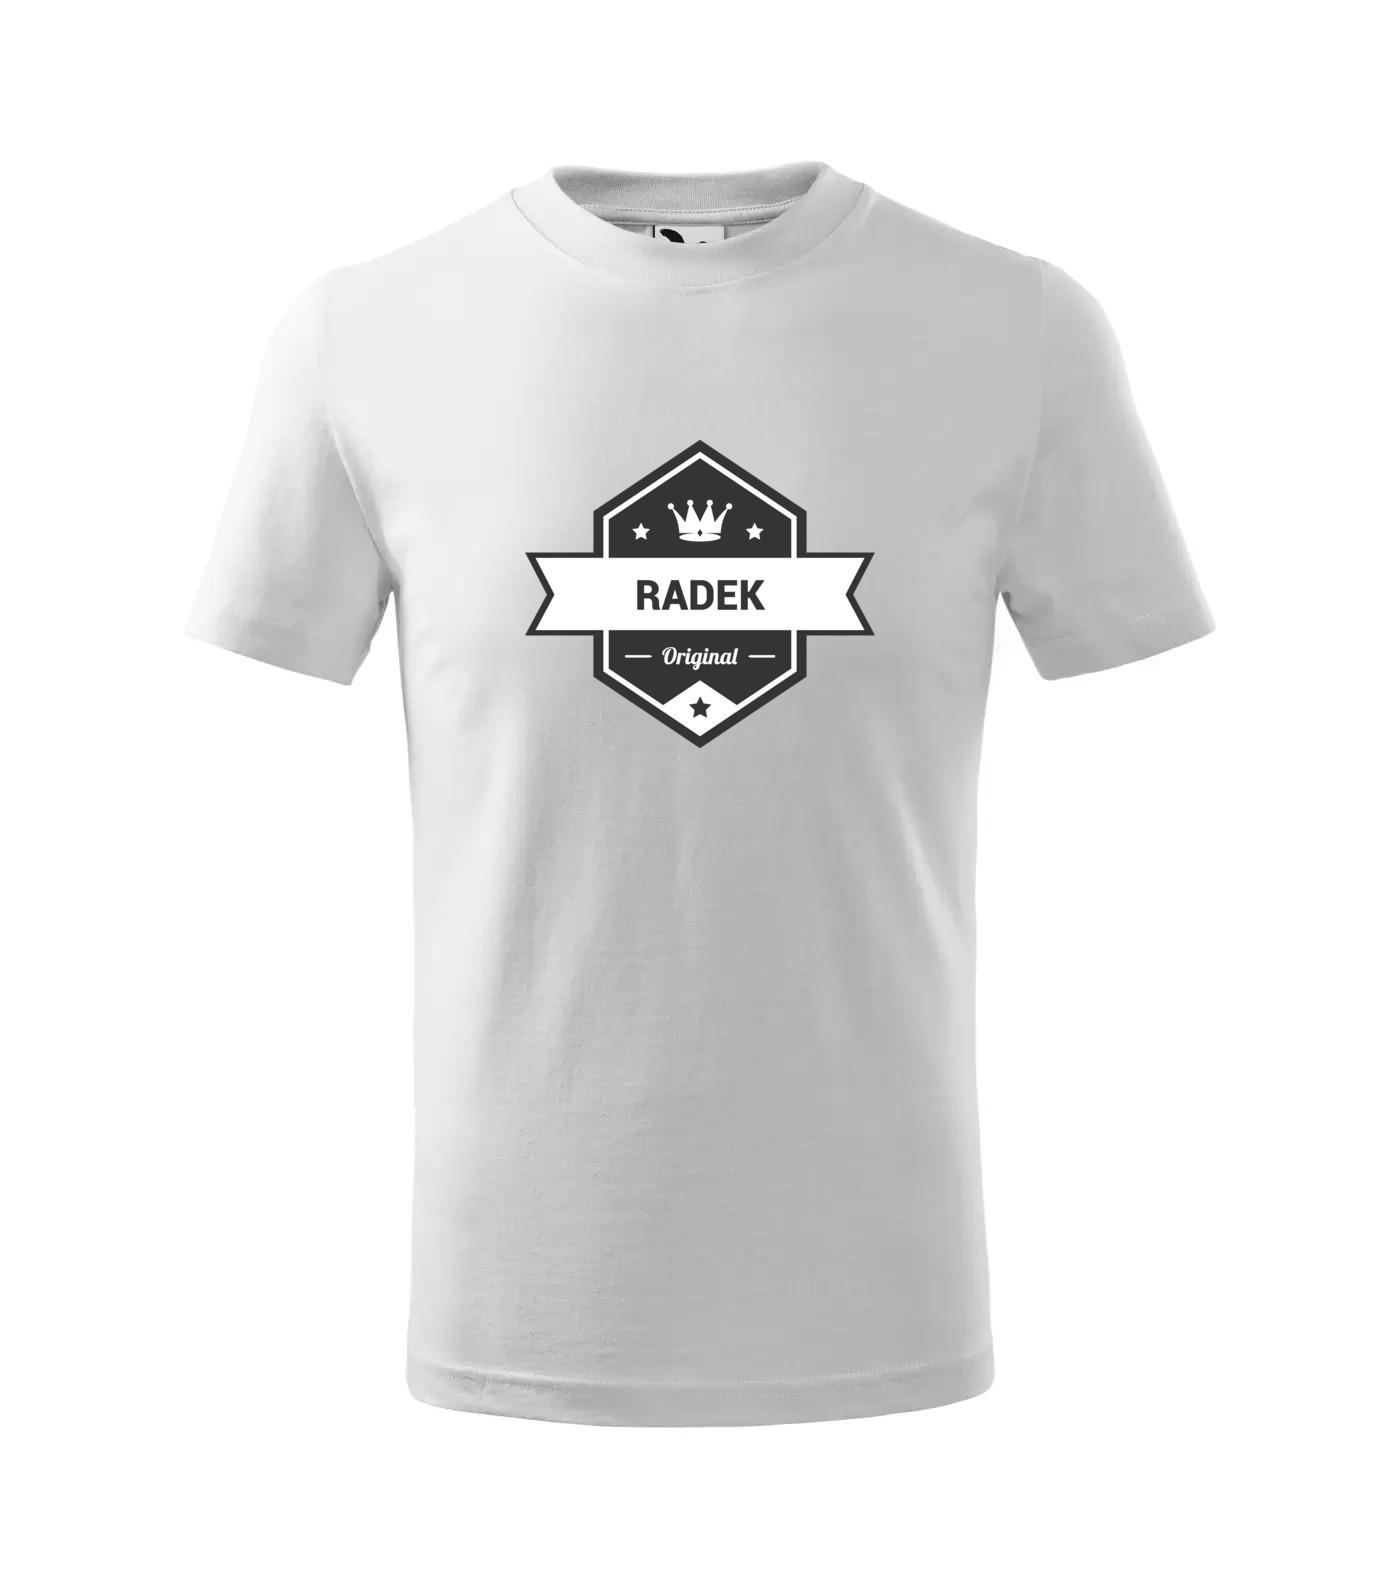 Tričko King Radek